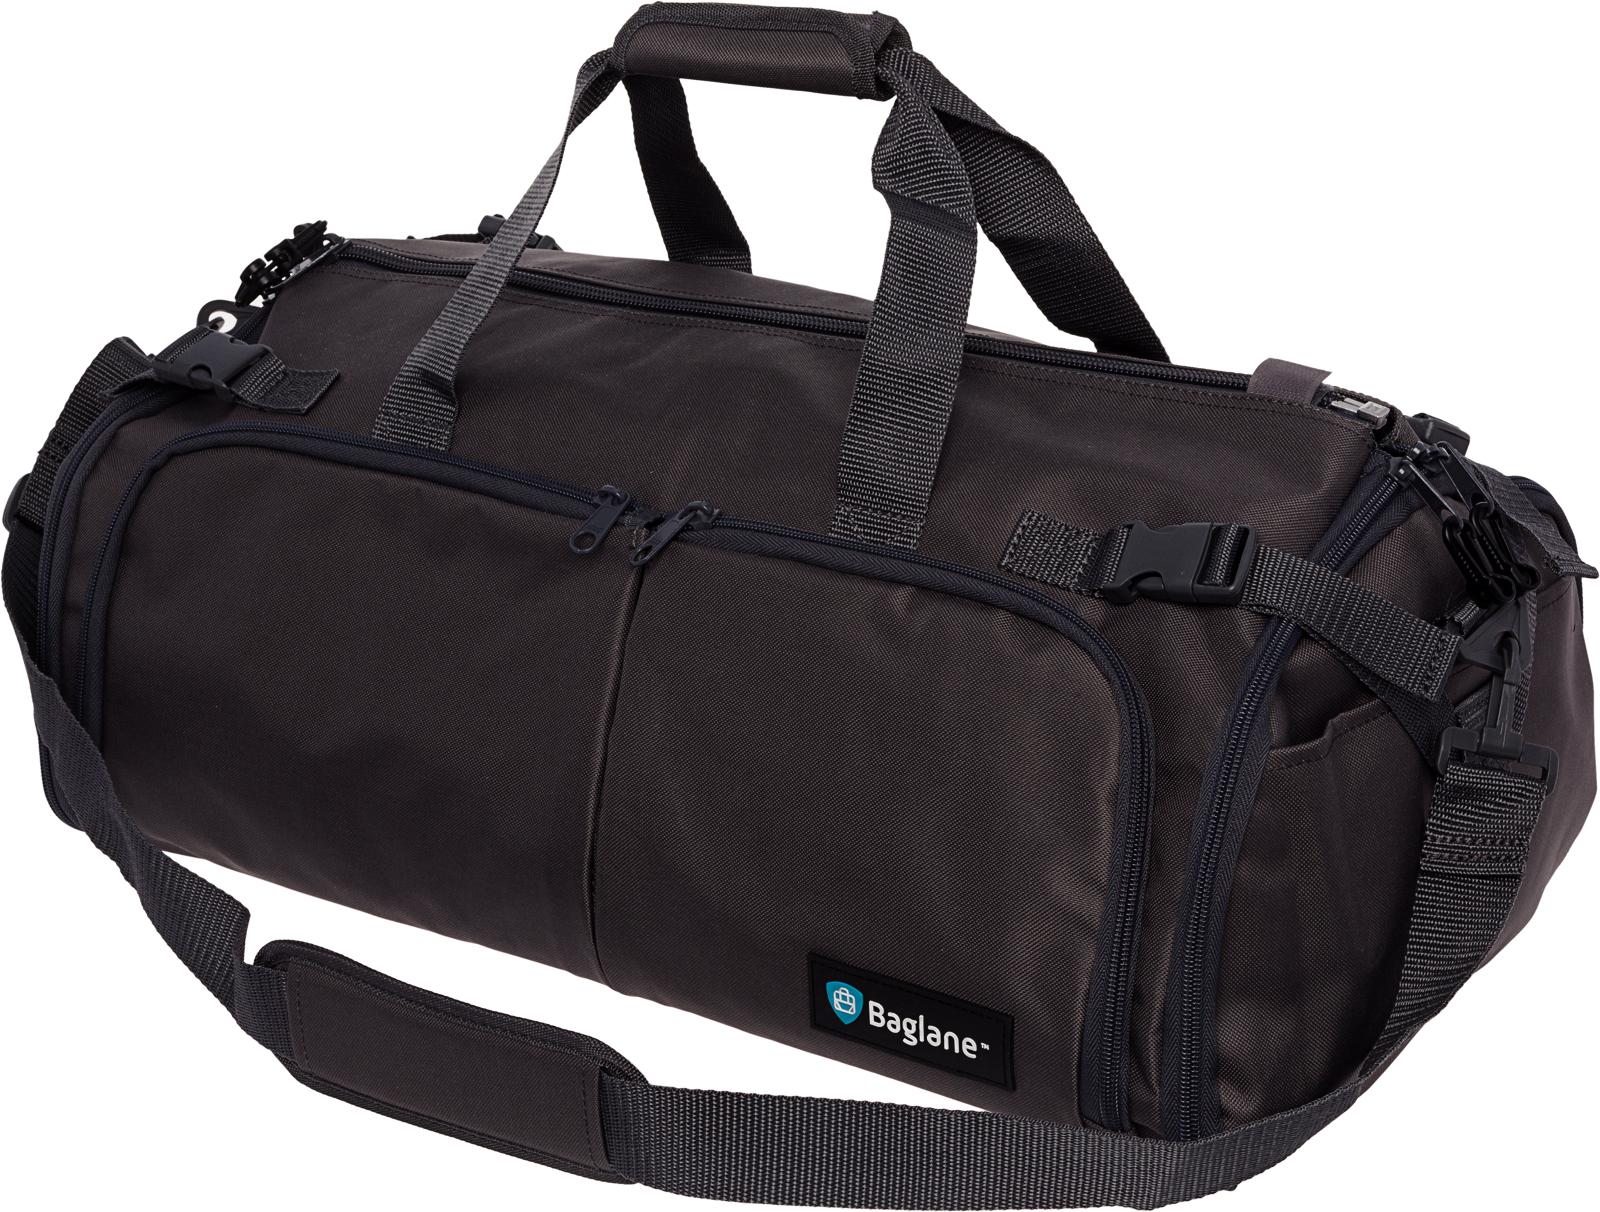 Baglane Canvas Hybrid 2 In 1 Travel Backpack